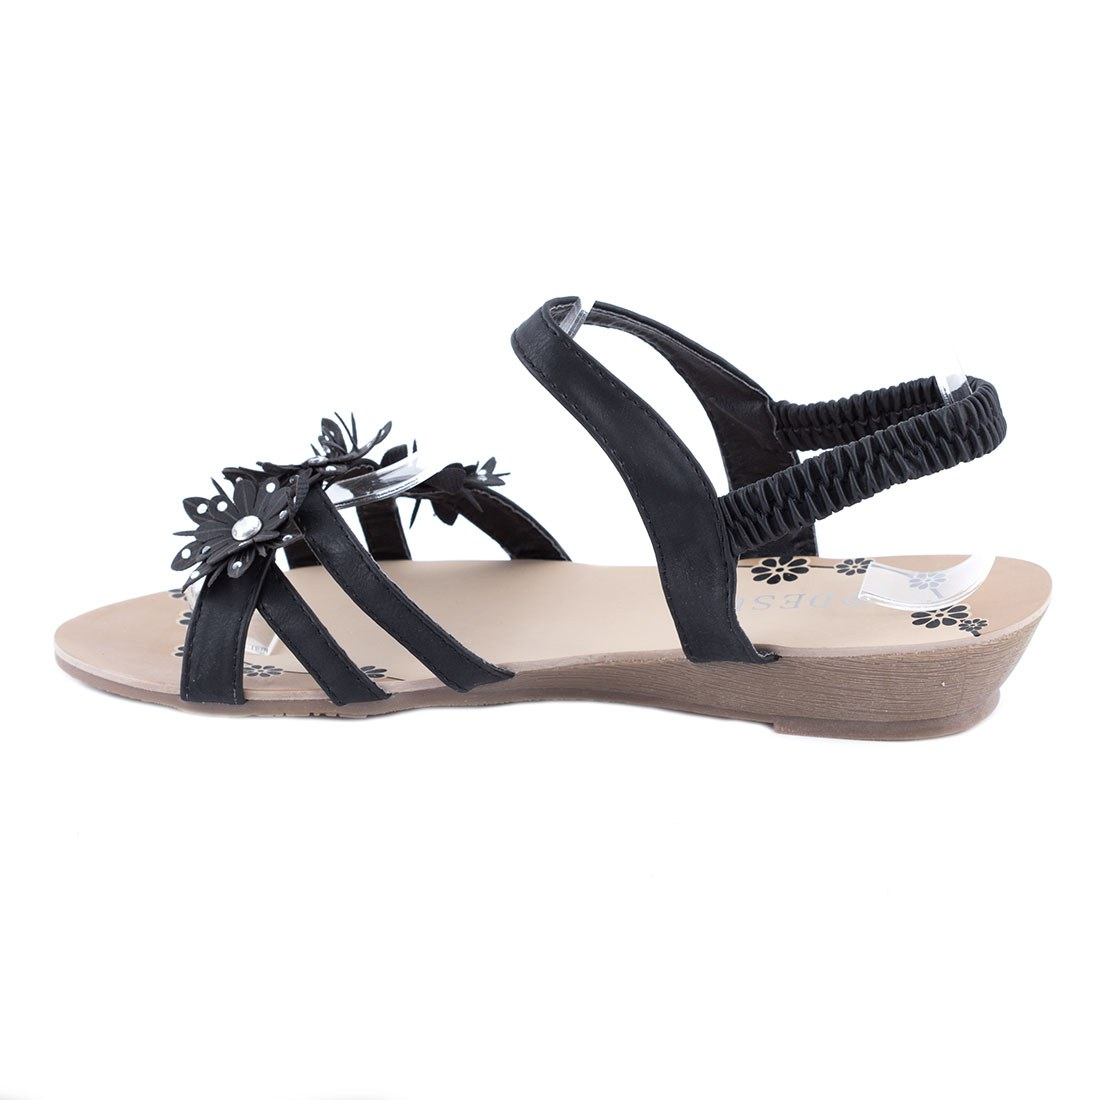 Sandale dama cu talpa joasa K-58-GRI la 29,99Lei - Zibra.ro